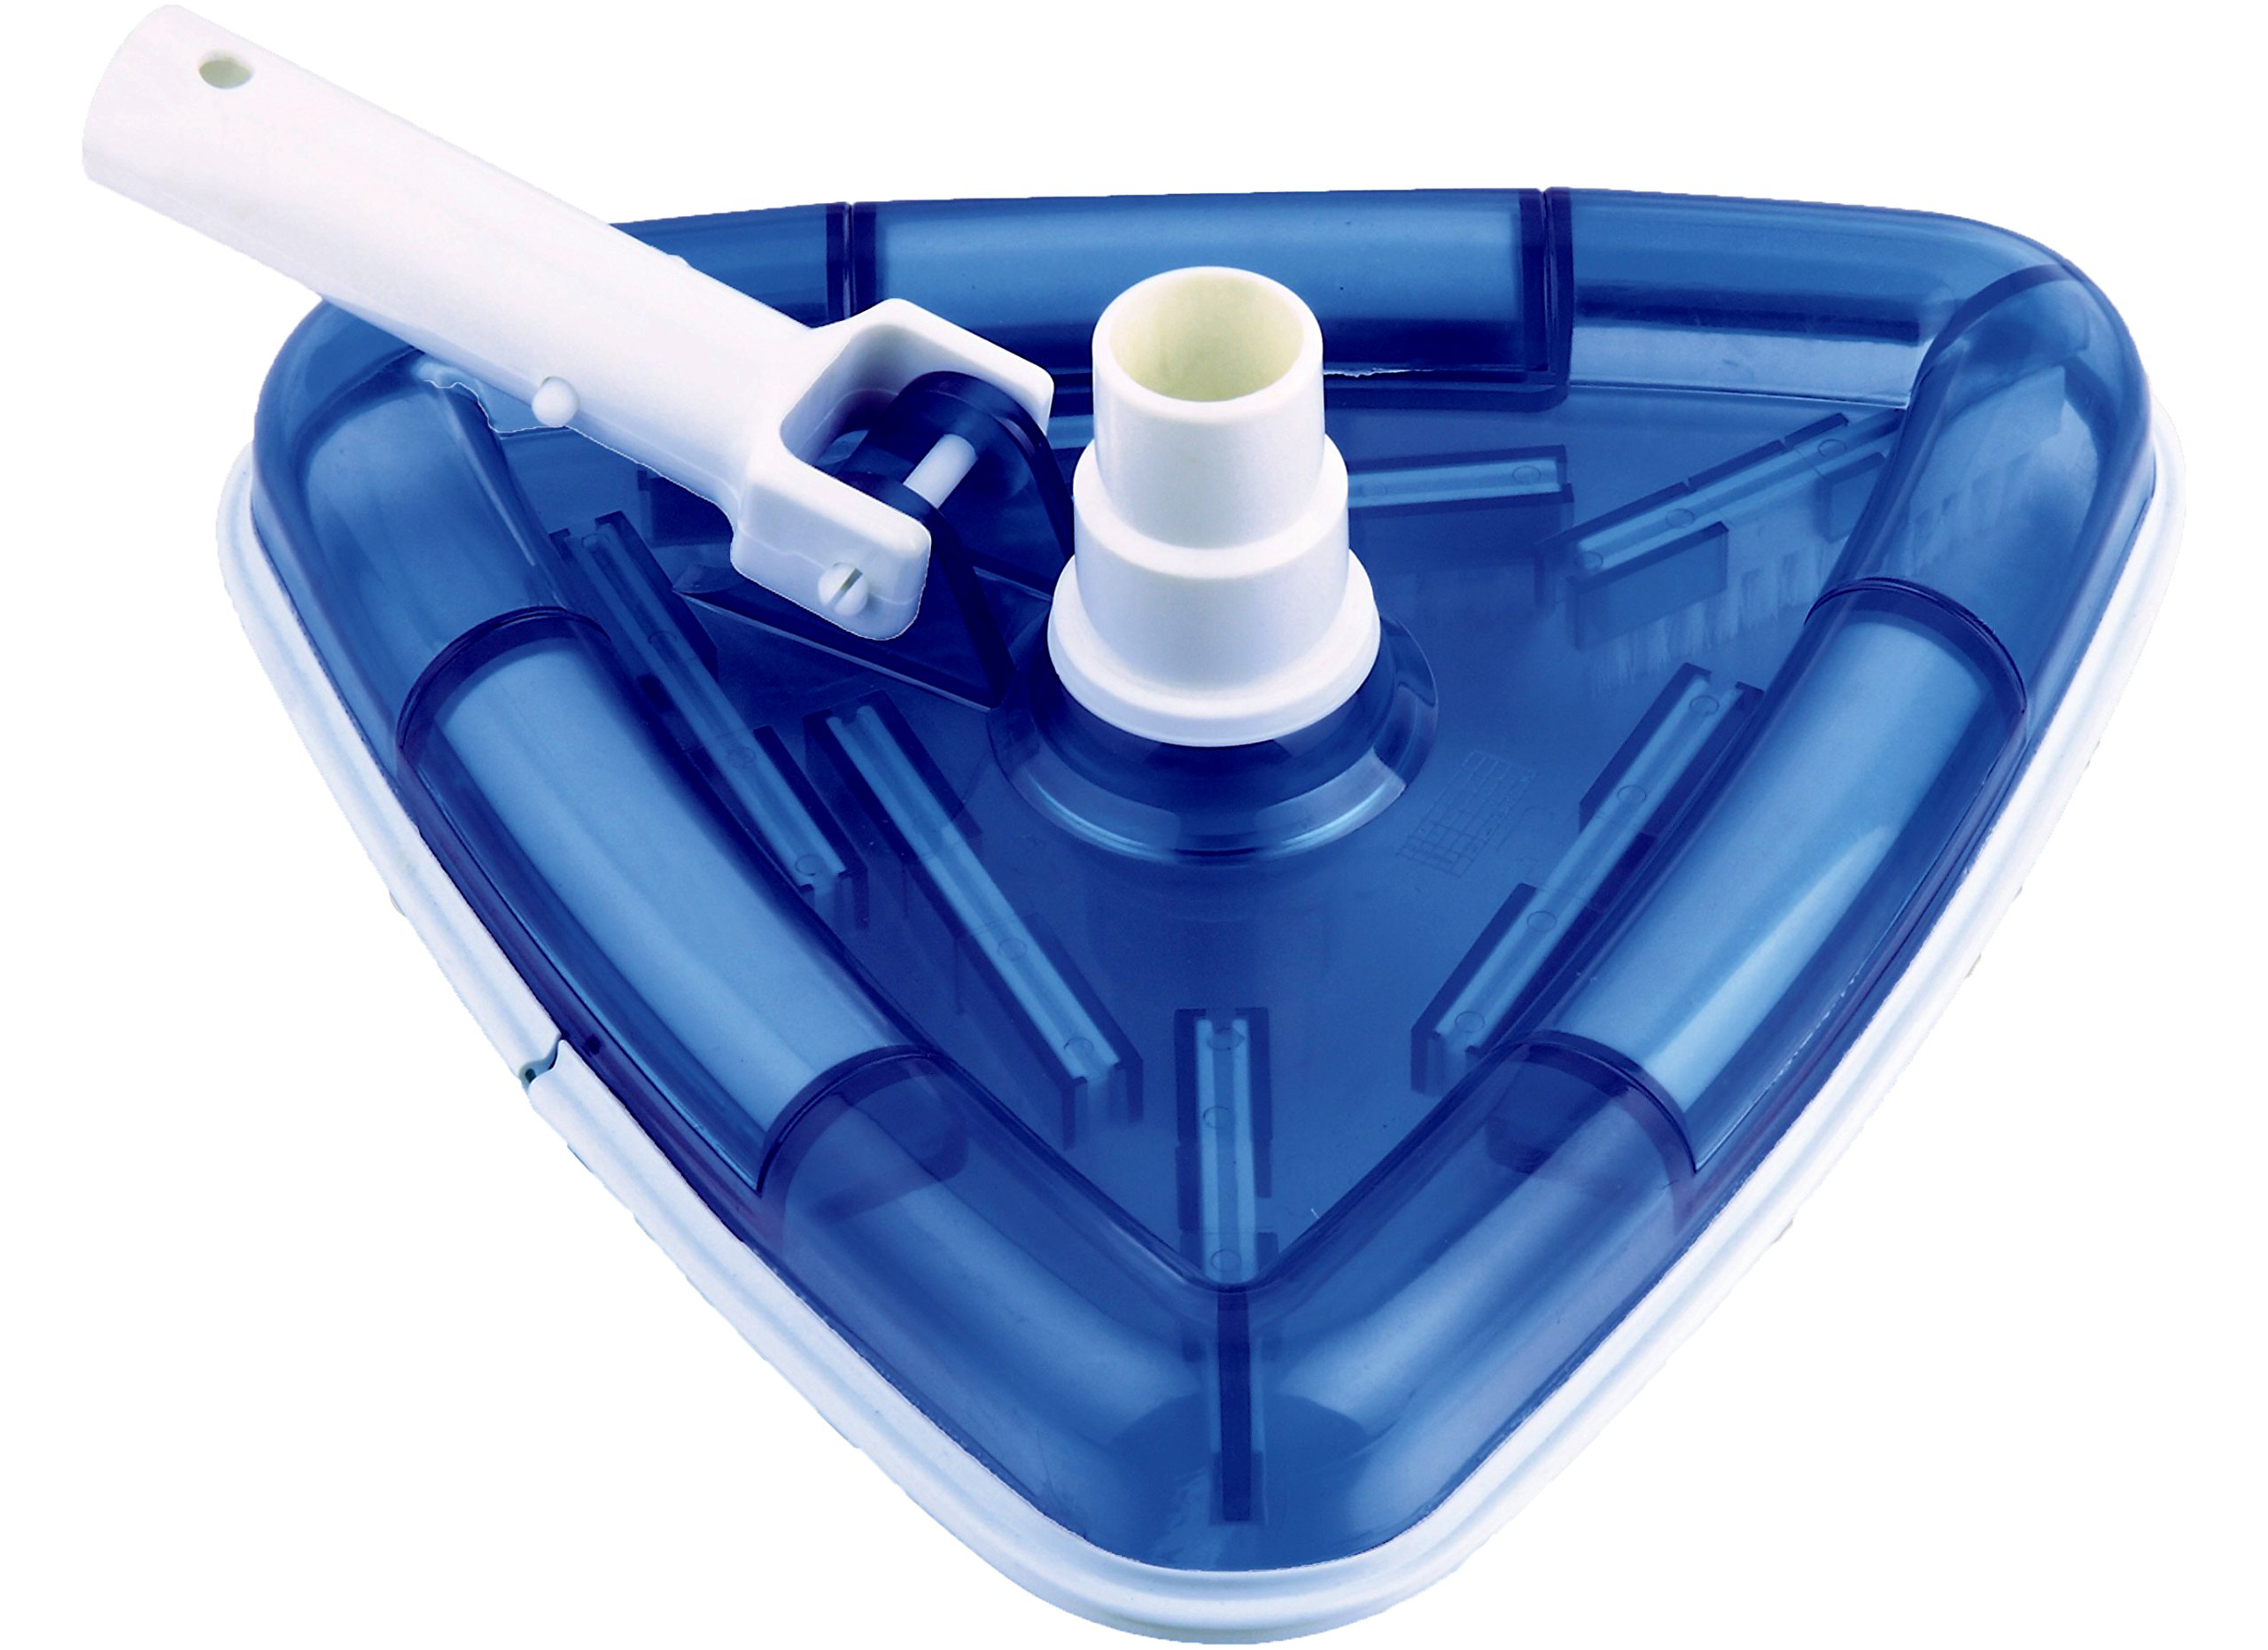 SmartPool Deluxe See Thru Vacuum Head, Small, White Blue